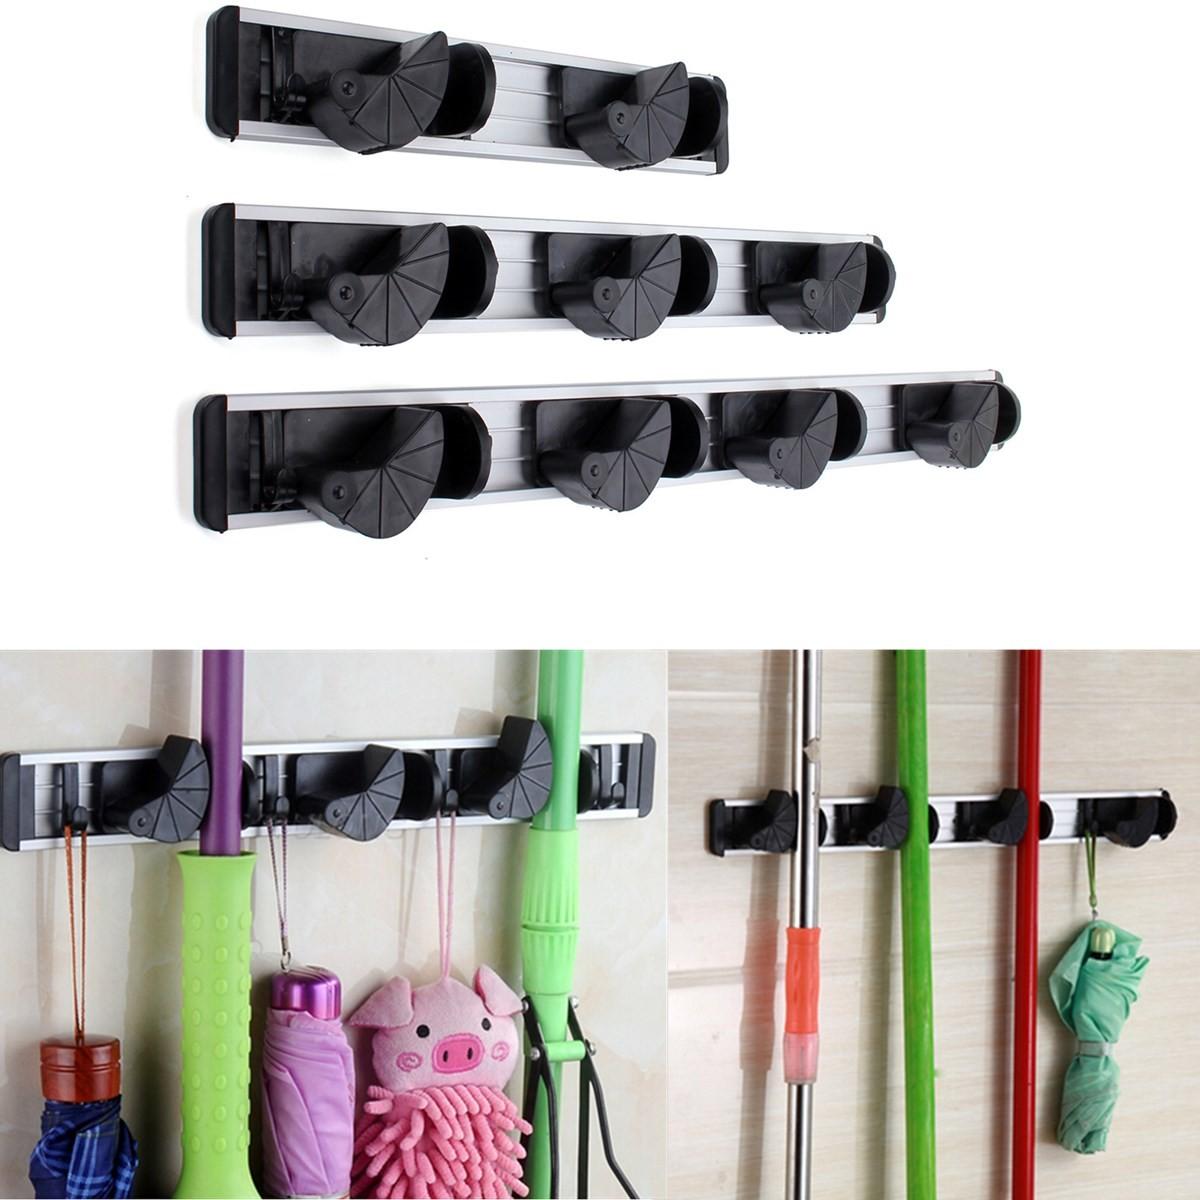 Multiduction Aluminium Wall Mounted Mop Broom Holder Brush